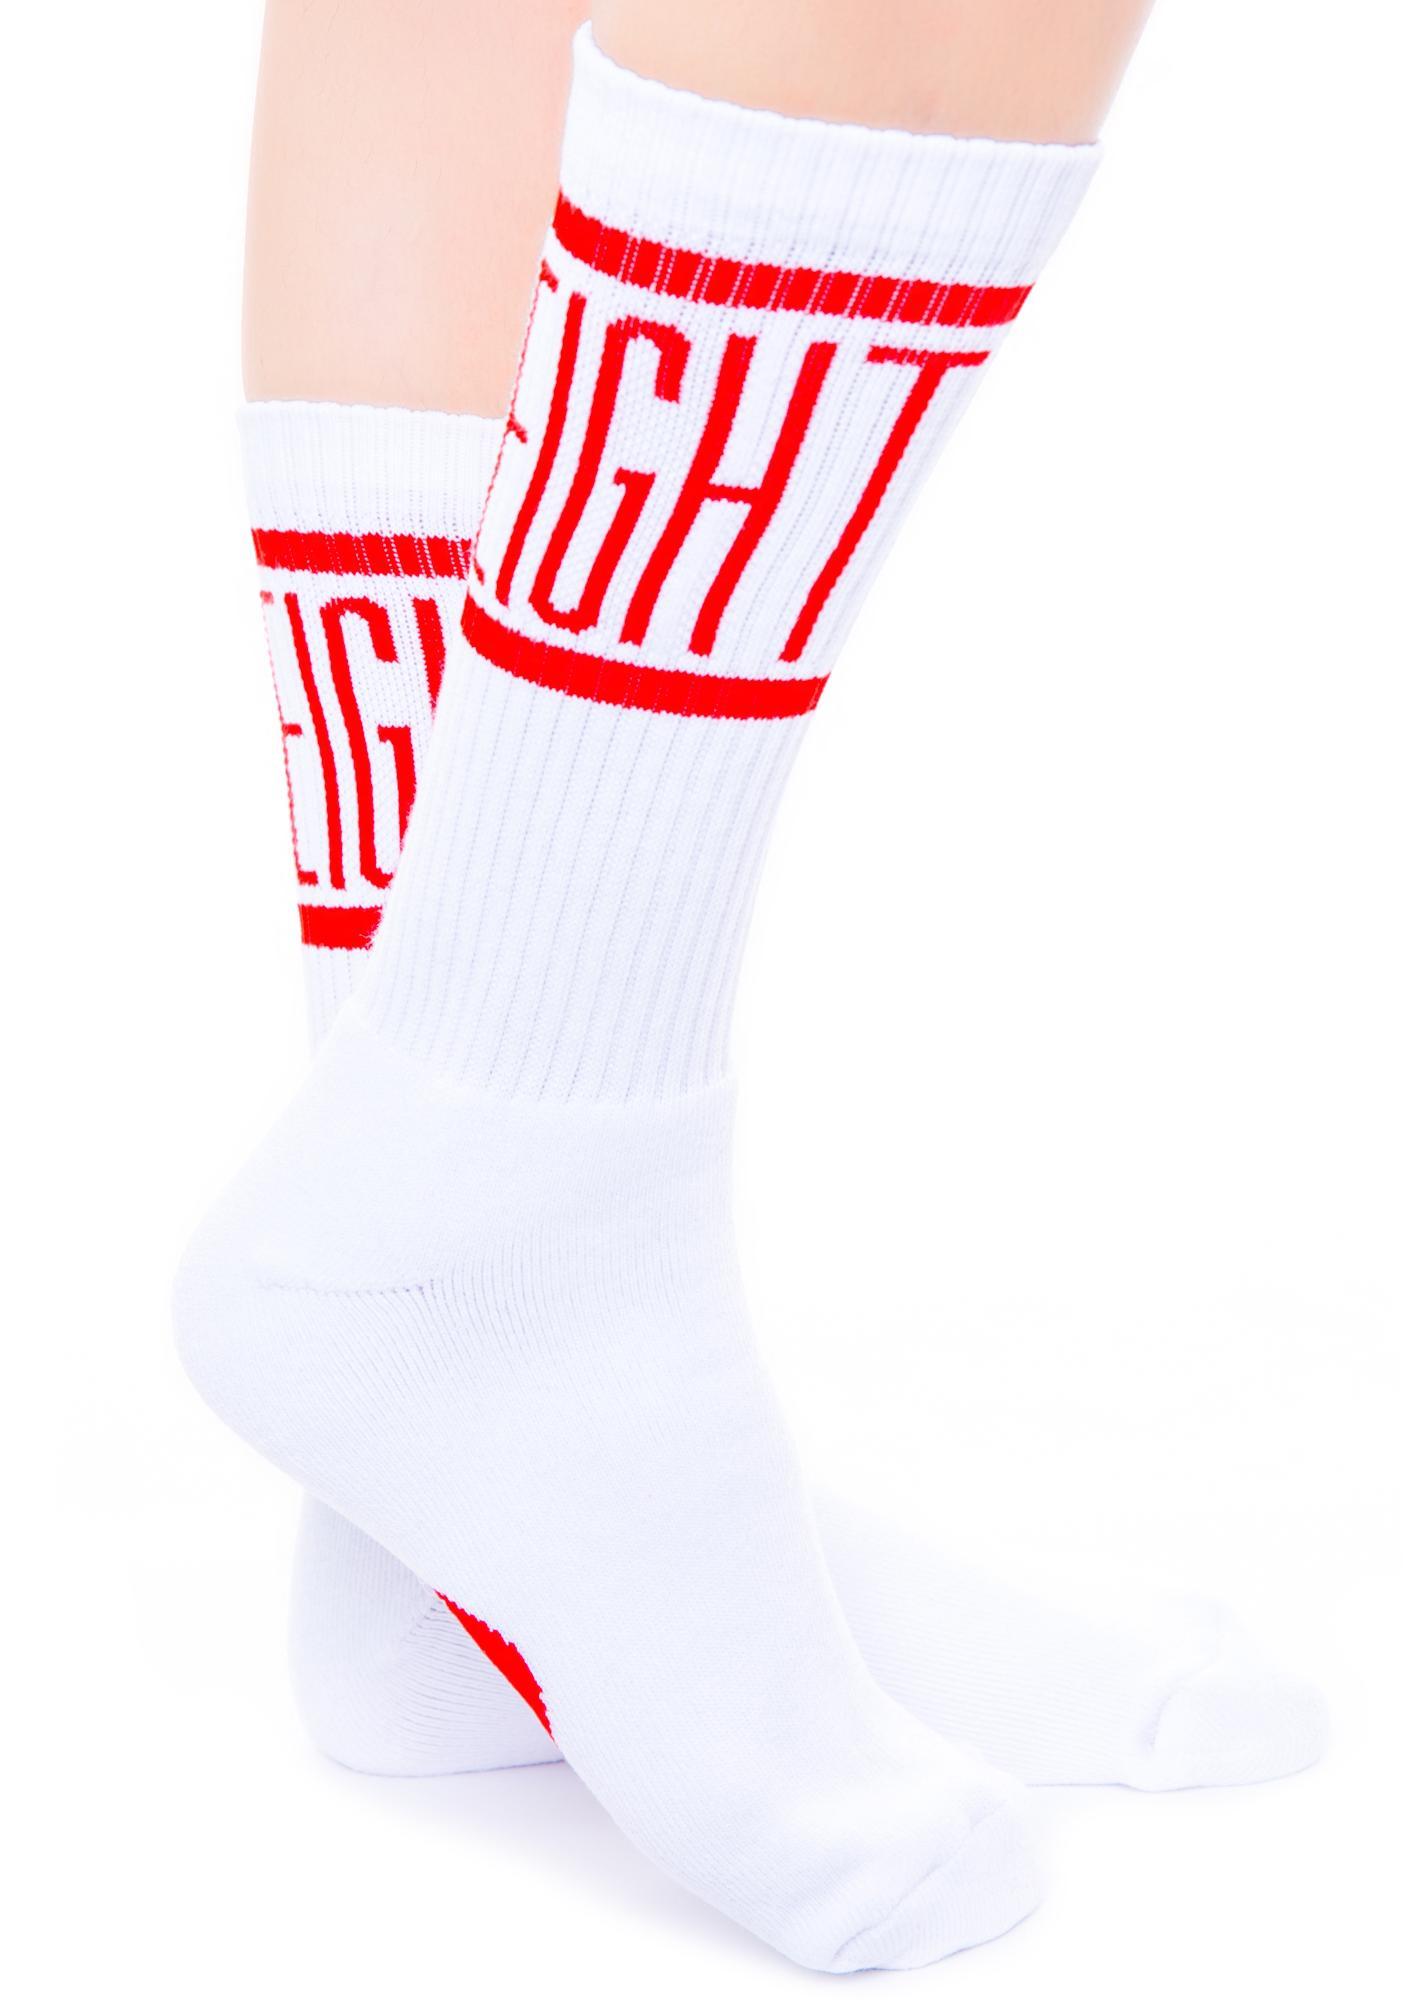 Rebel8 Degenerate Socks